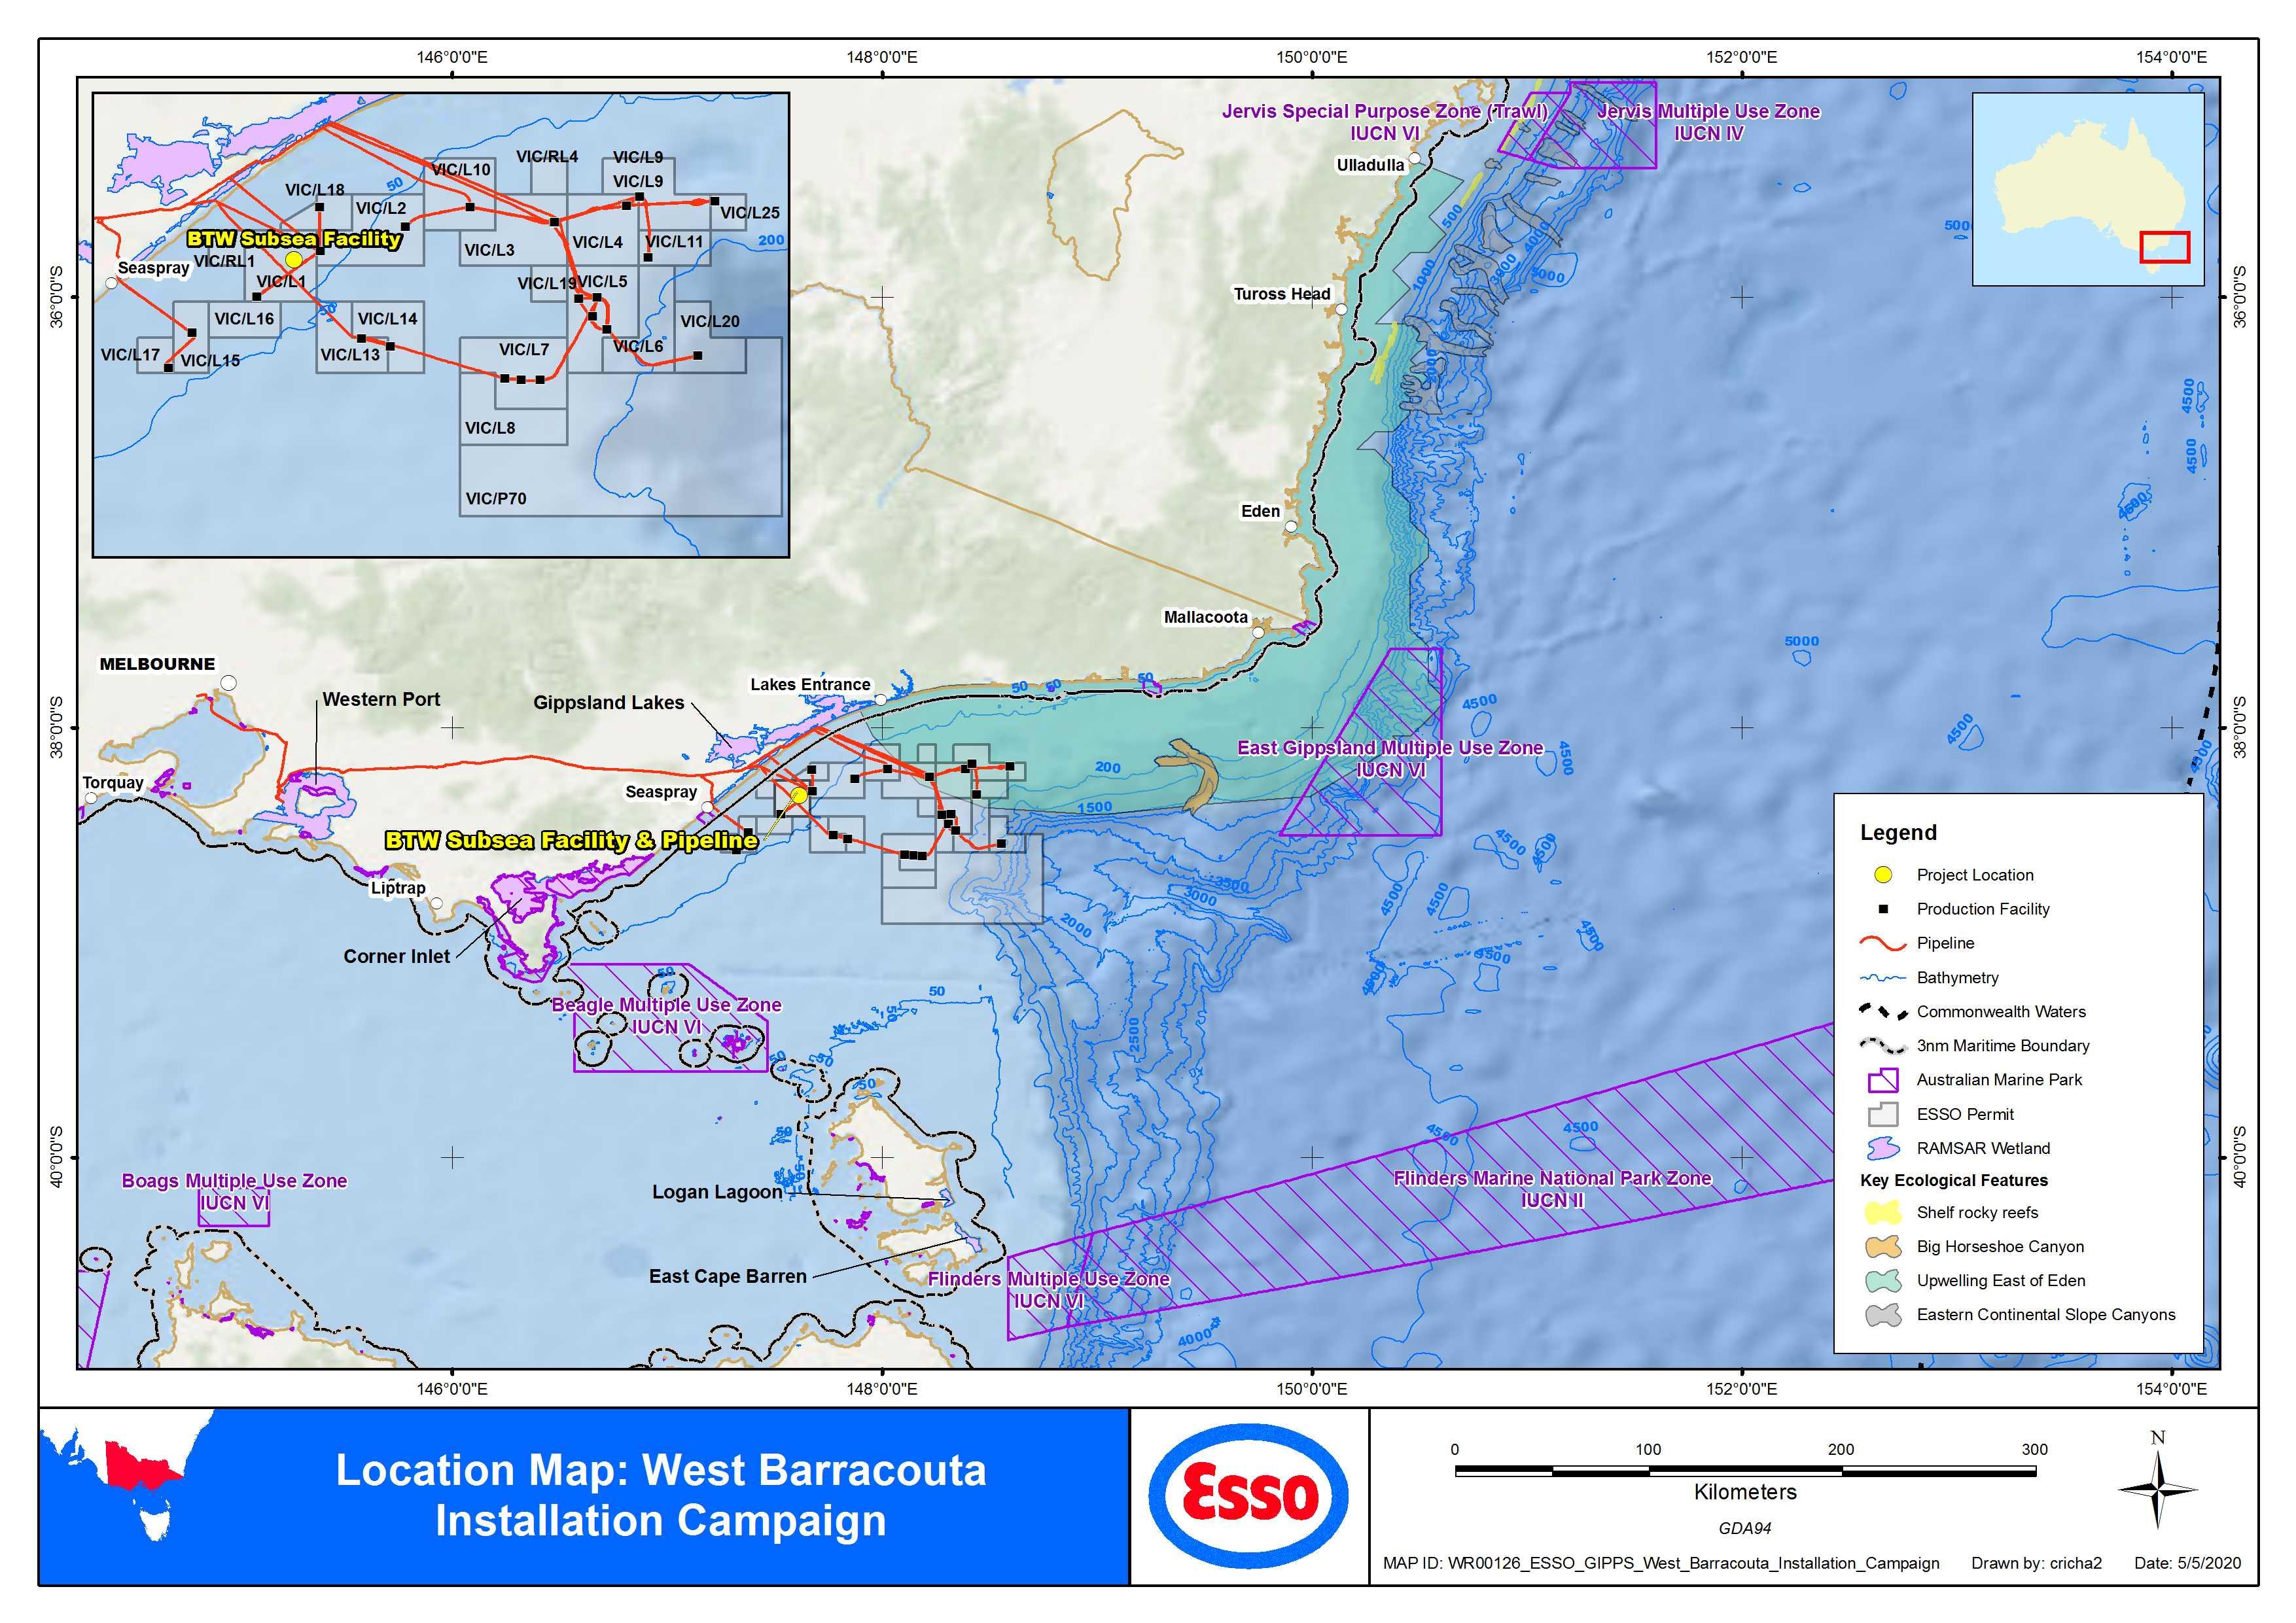 Location map - Activity: BTW Installation  (refer to description)